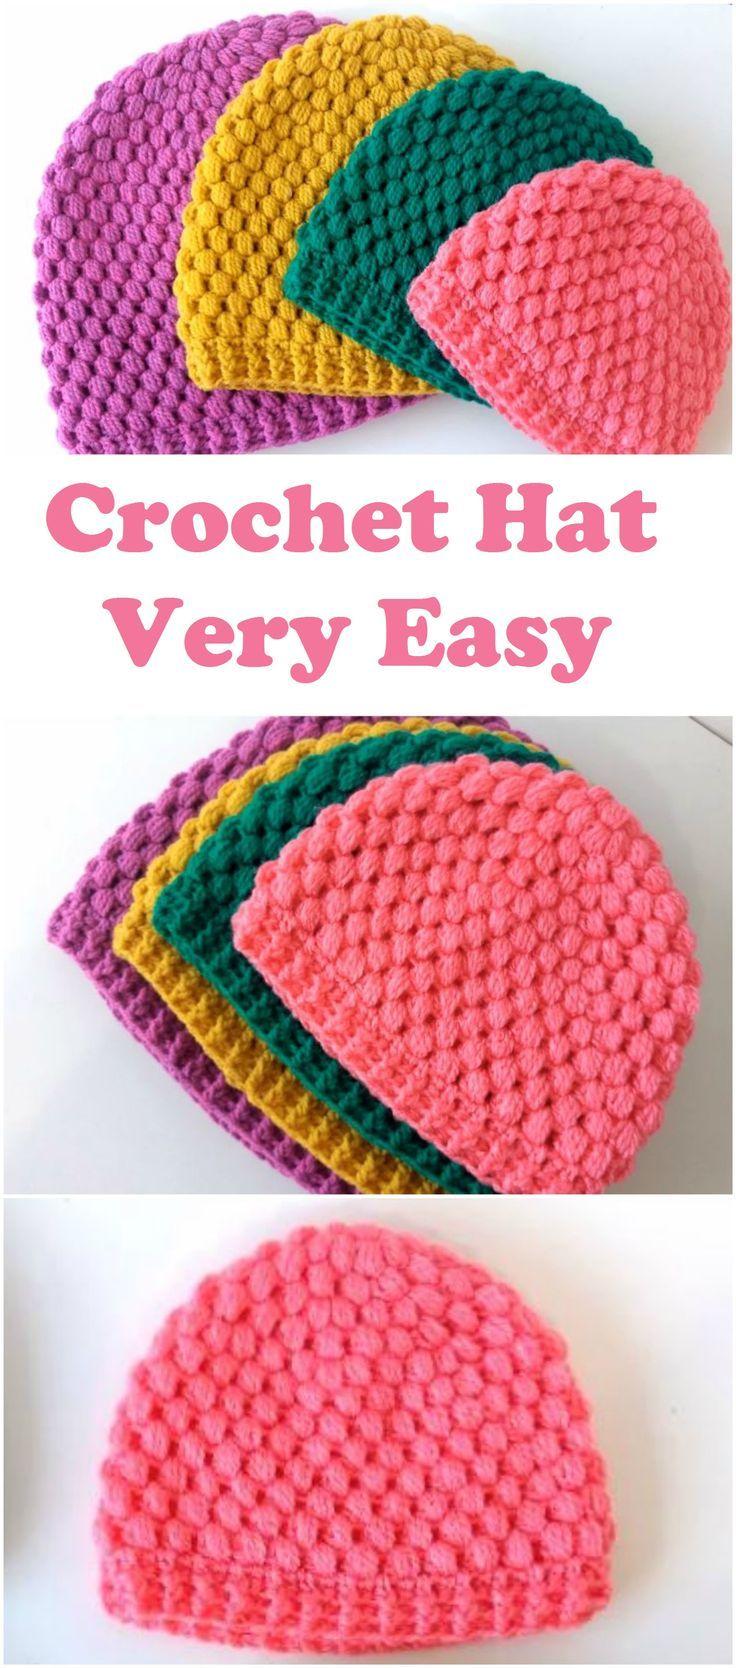 Crochet Bubble Stitch Hat | Crochet - Newborn Hats to Donate ...